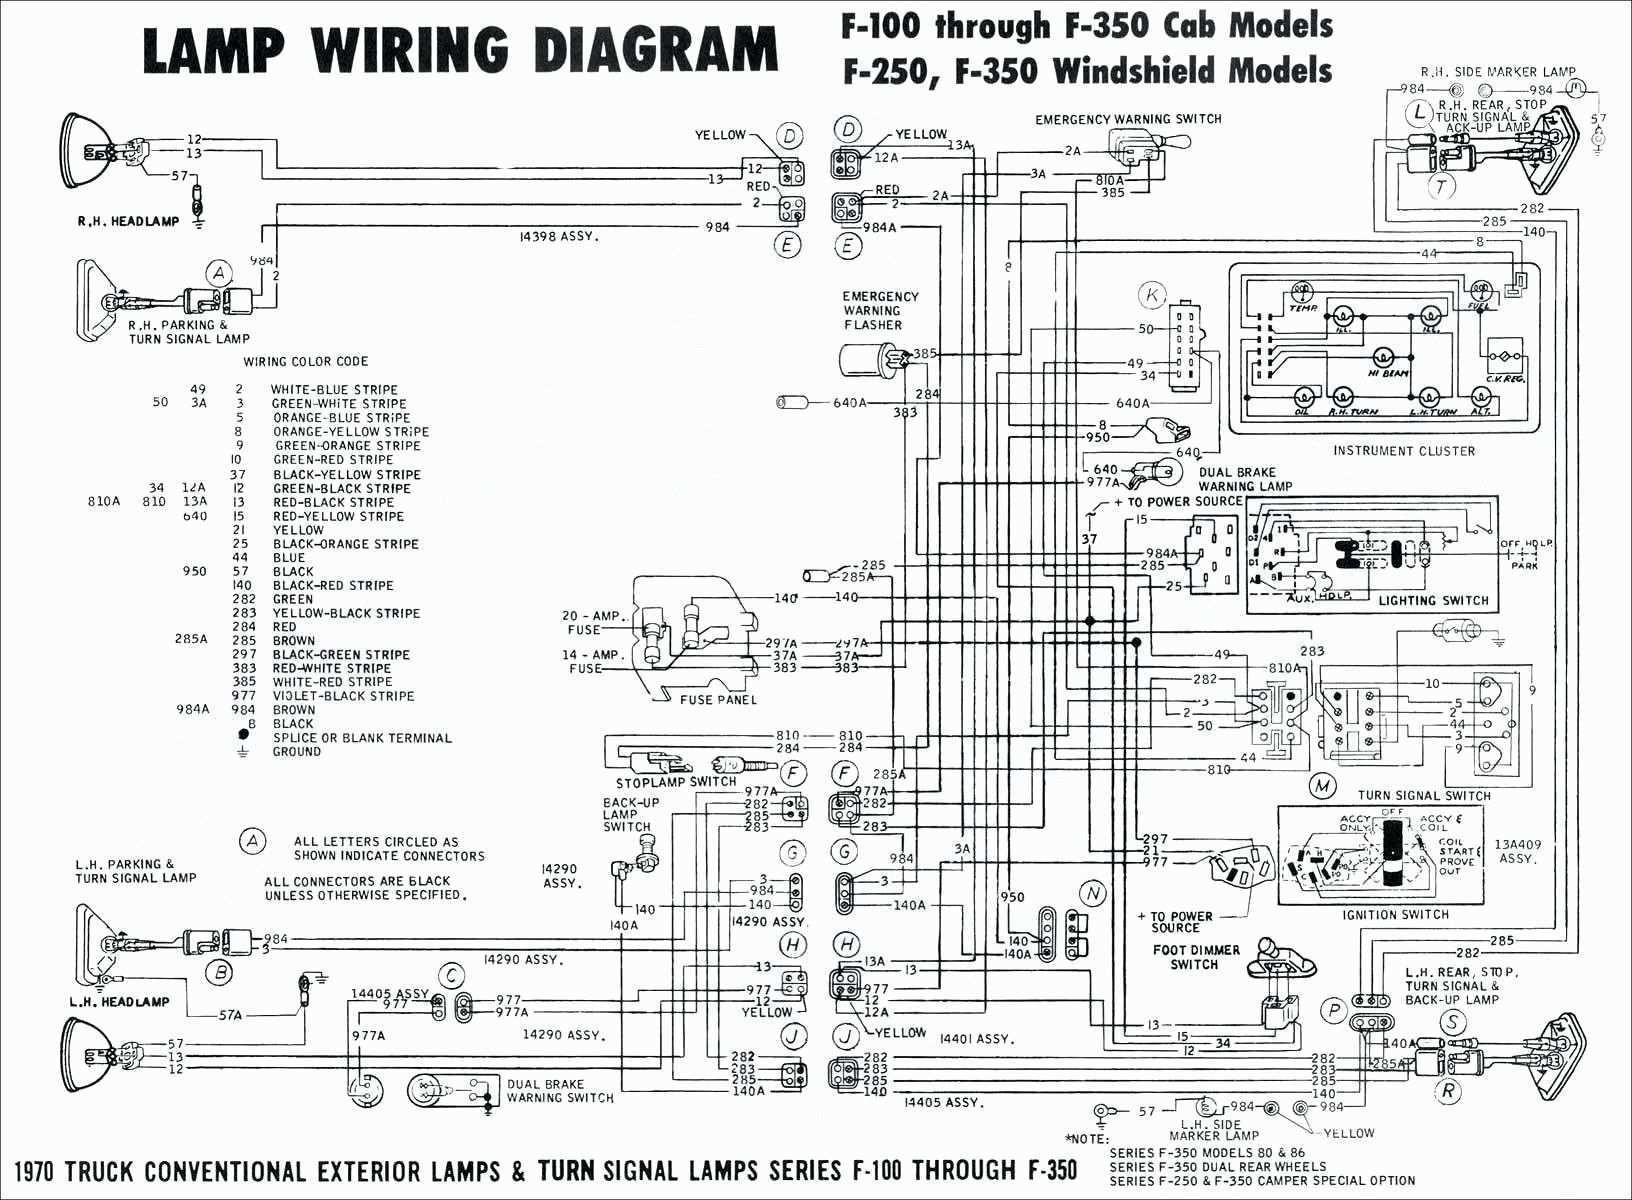 Opel Corsa Utility Wiring Diagram